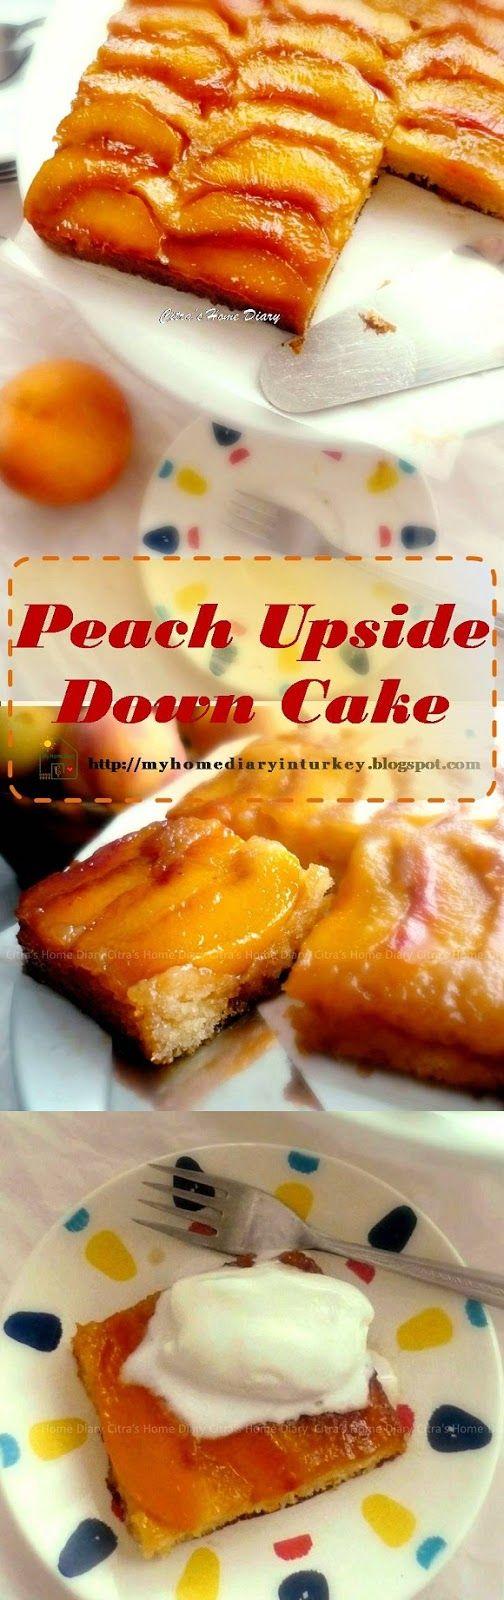 Peach Upside Down Cake.My family love it too especially served with Turkish milk cream call Kaymak..hmmm..even more Yum!  #peach #upsidedowncake #dessert #fruittycake #apple